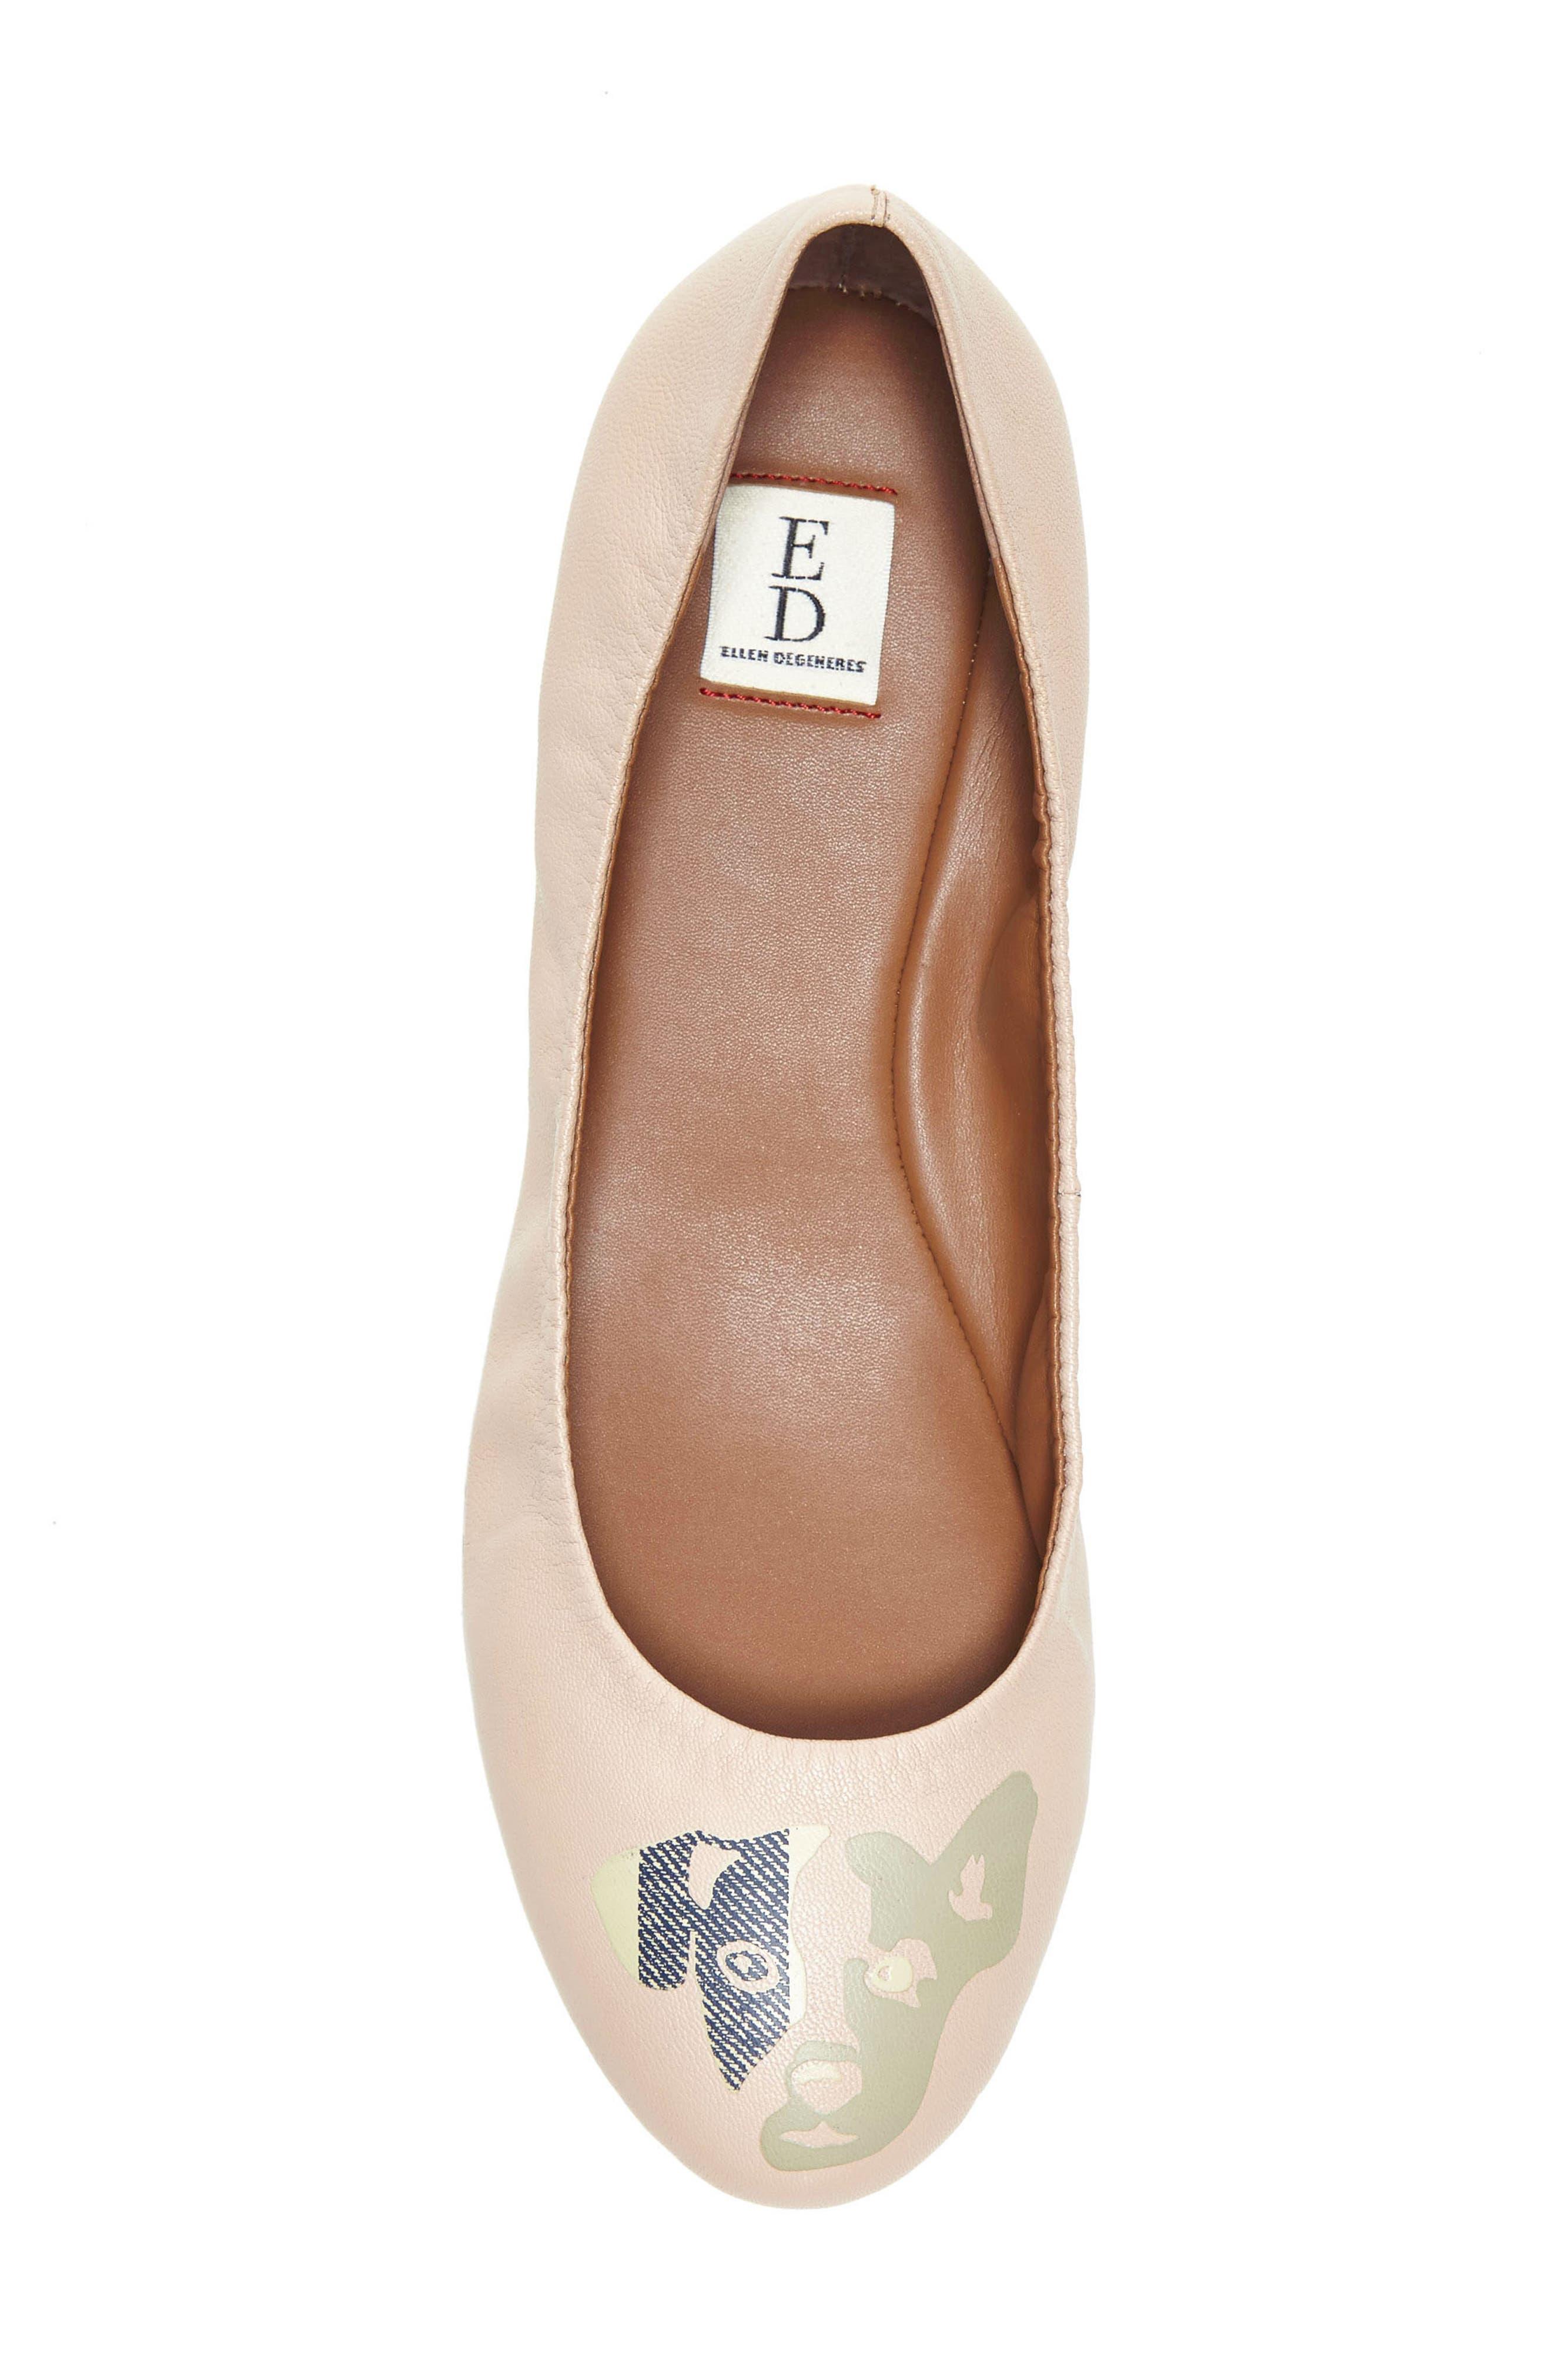 'Langston' Ballet Flat,                             Alternate thumbnail 4, color,                             Misty Rose Leather